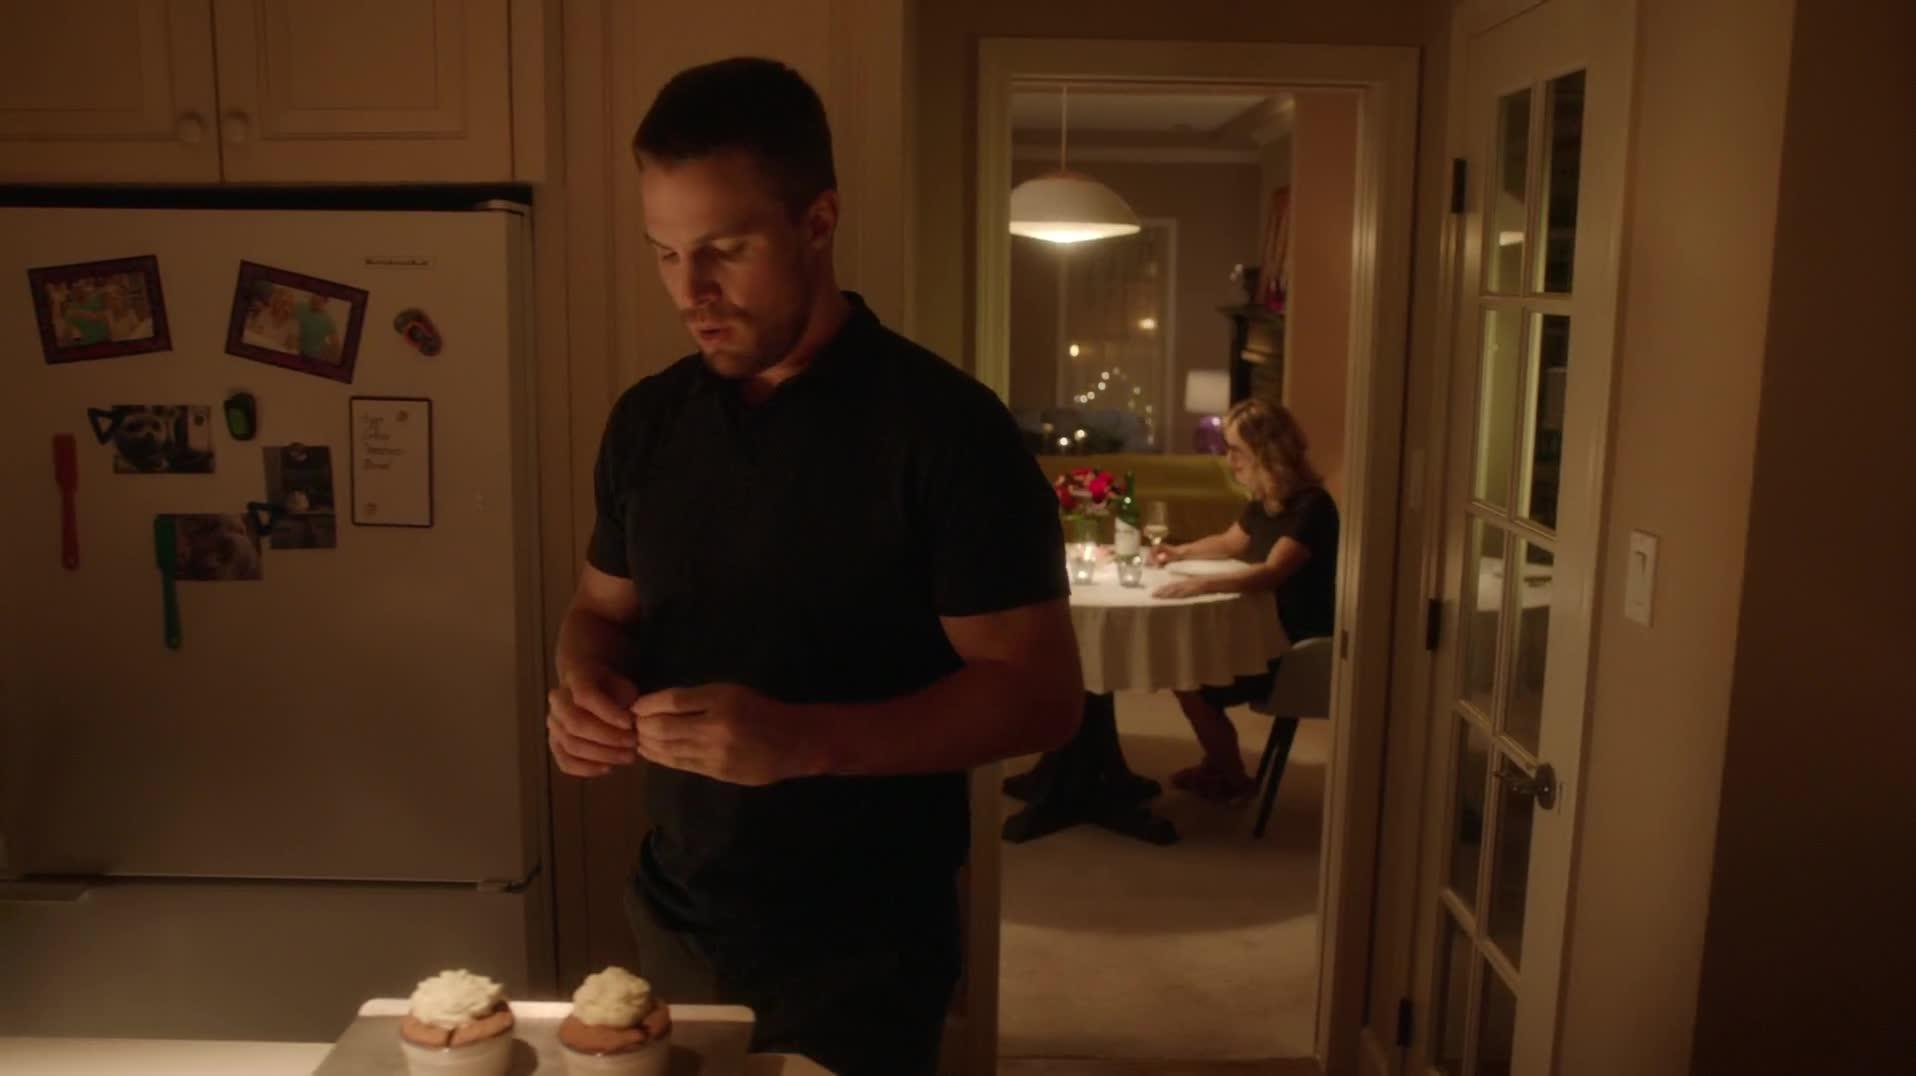 Стрела (4 сезон: 1-23 серии из 23) (2015) WEB-DLRip 1080p | LostFilm